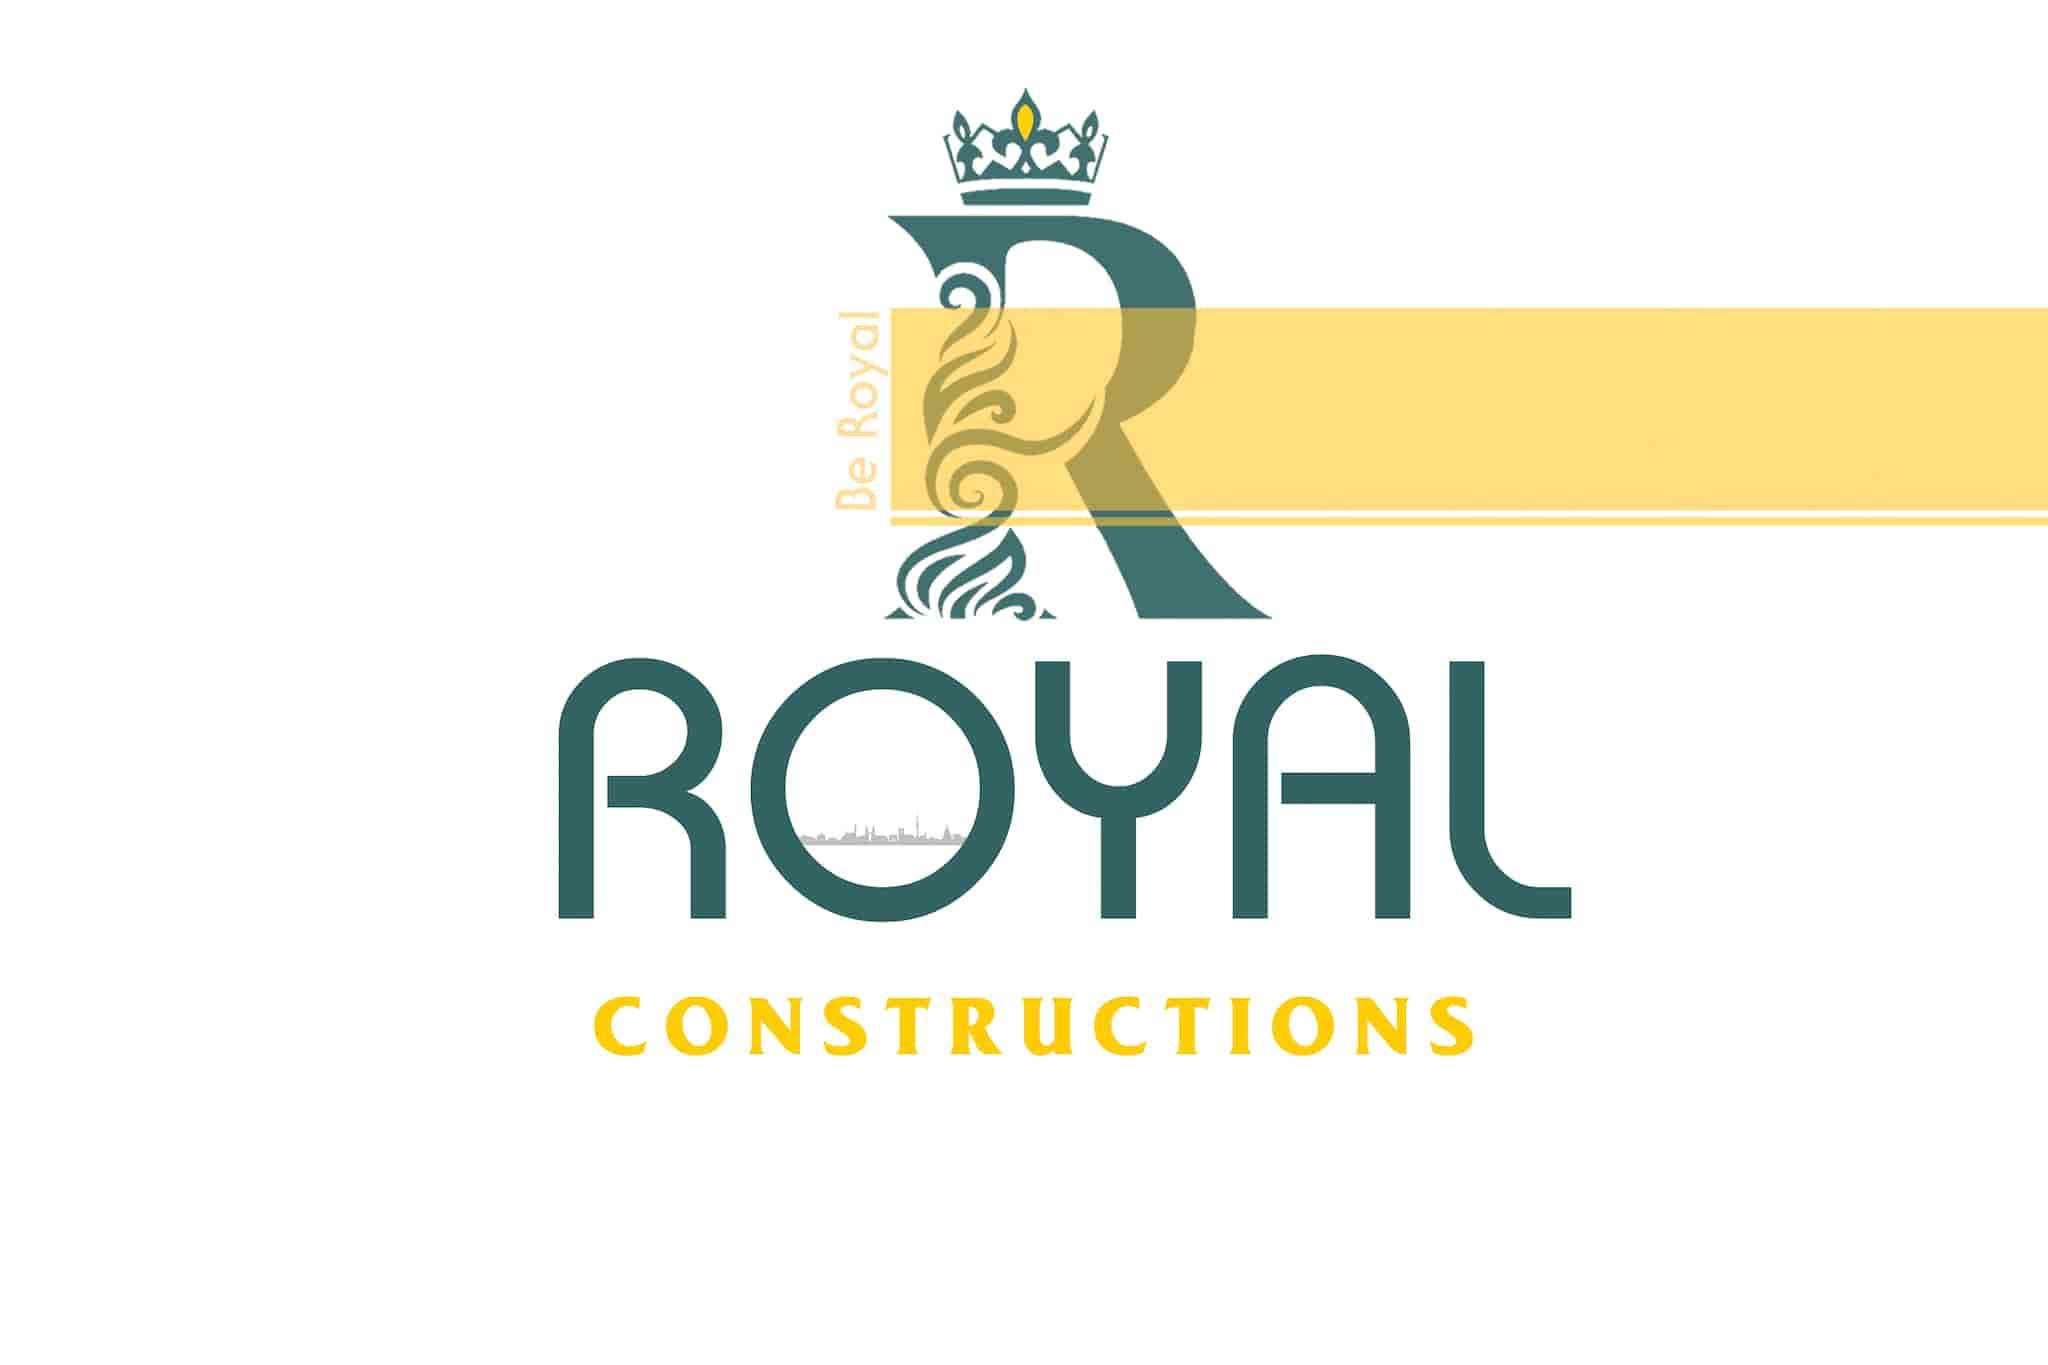 Royal Constructions, Vita City - Construction Contractors in